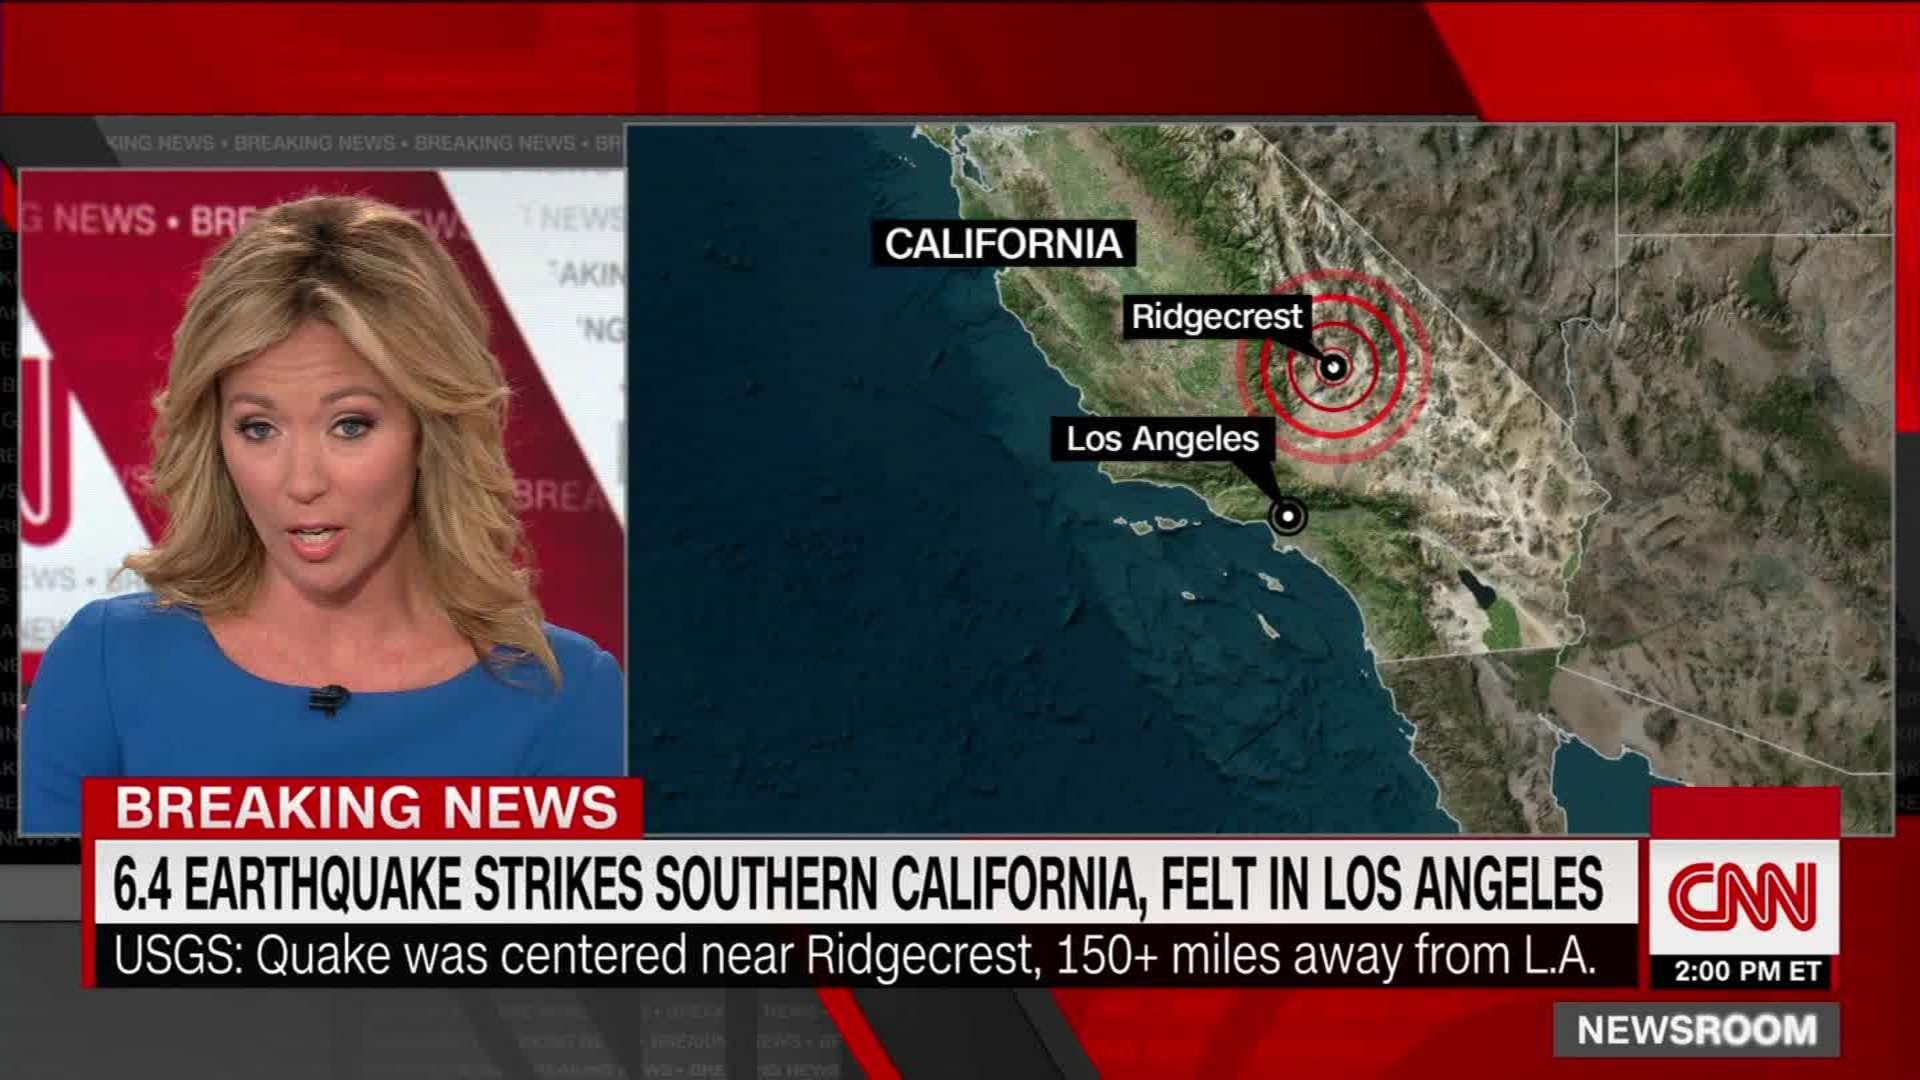 Man describes ride at Disneyland during 7 1 earthquake - CNN